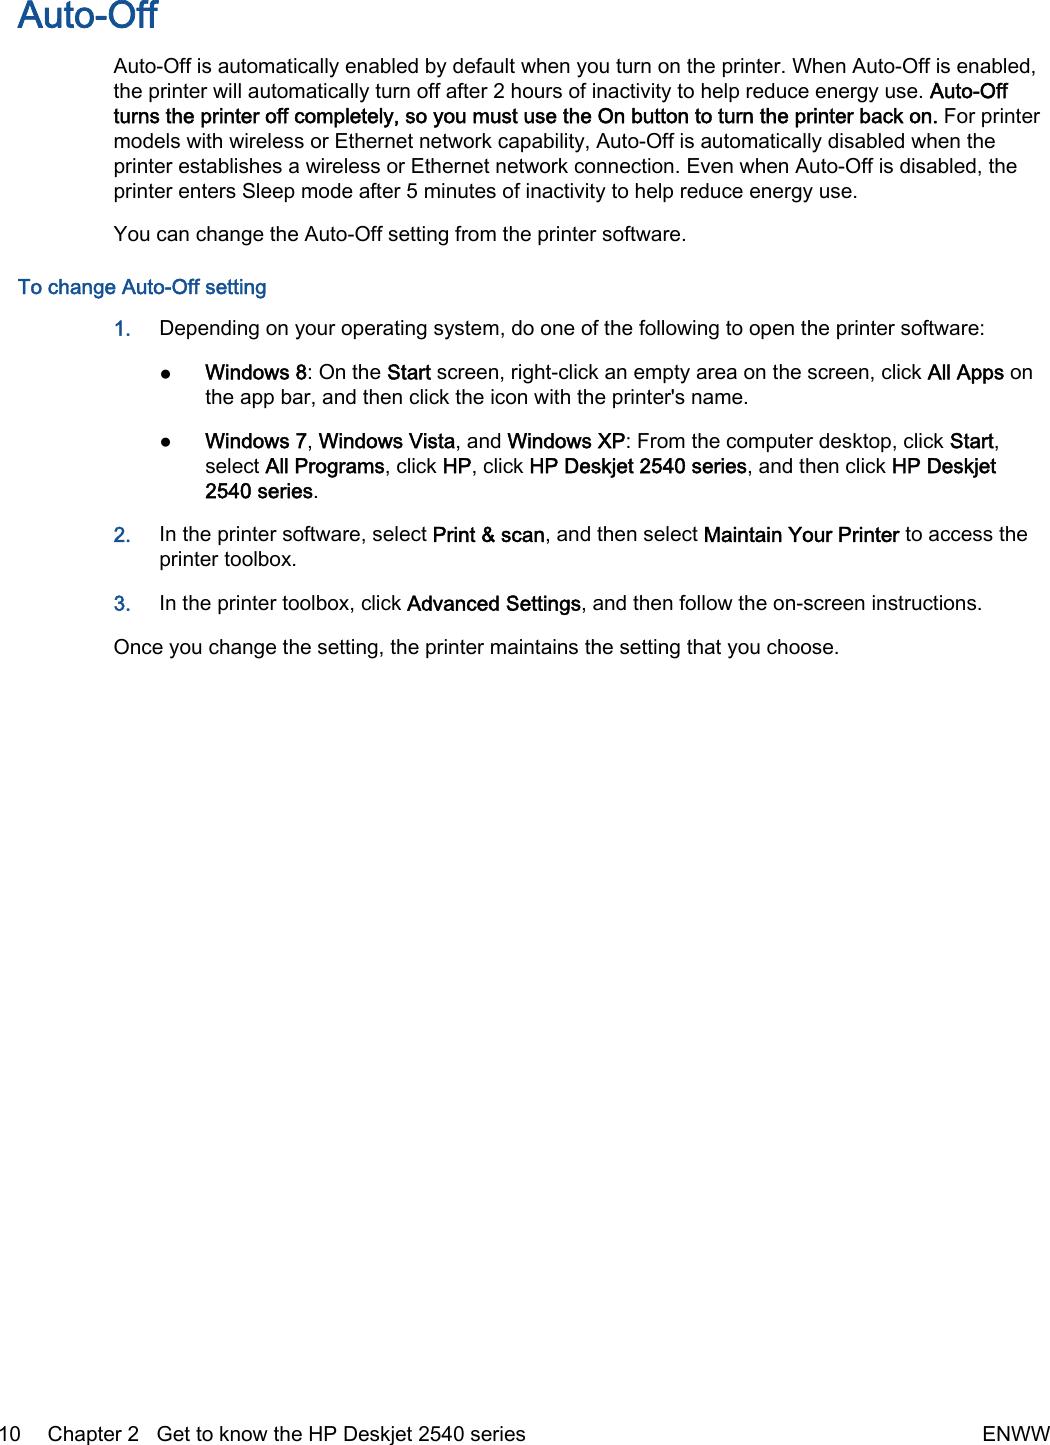 Hp Deskjet 2541 All In One Printer Users Manual